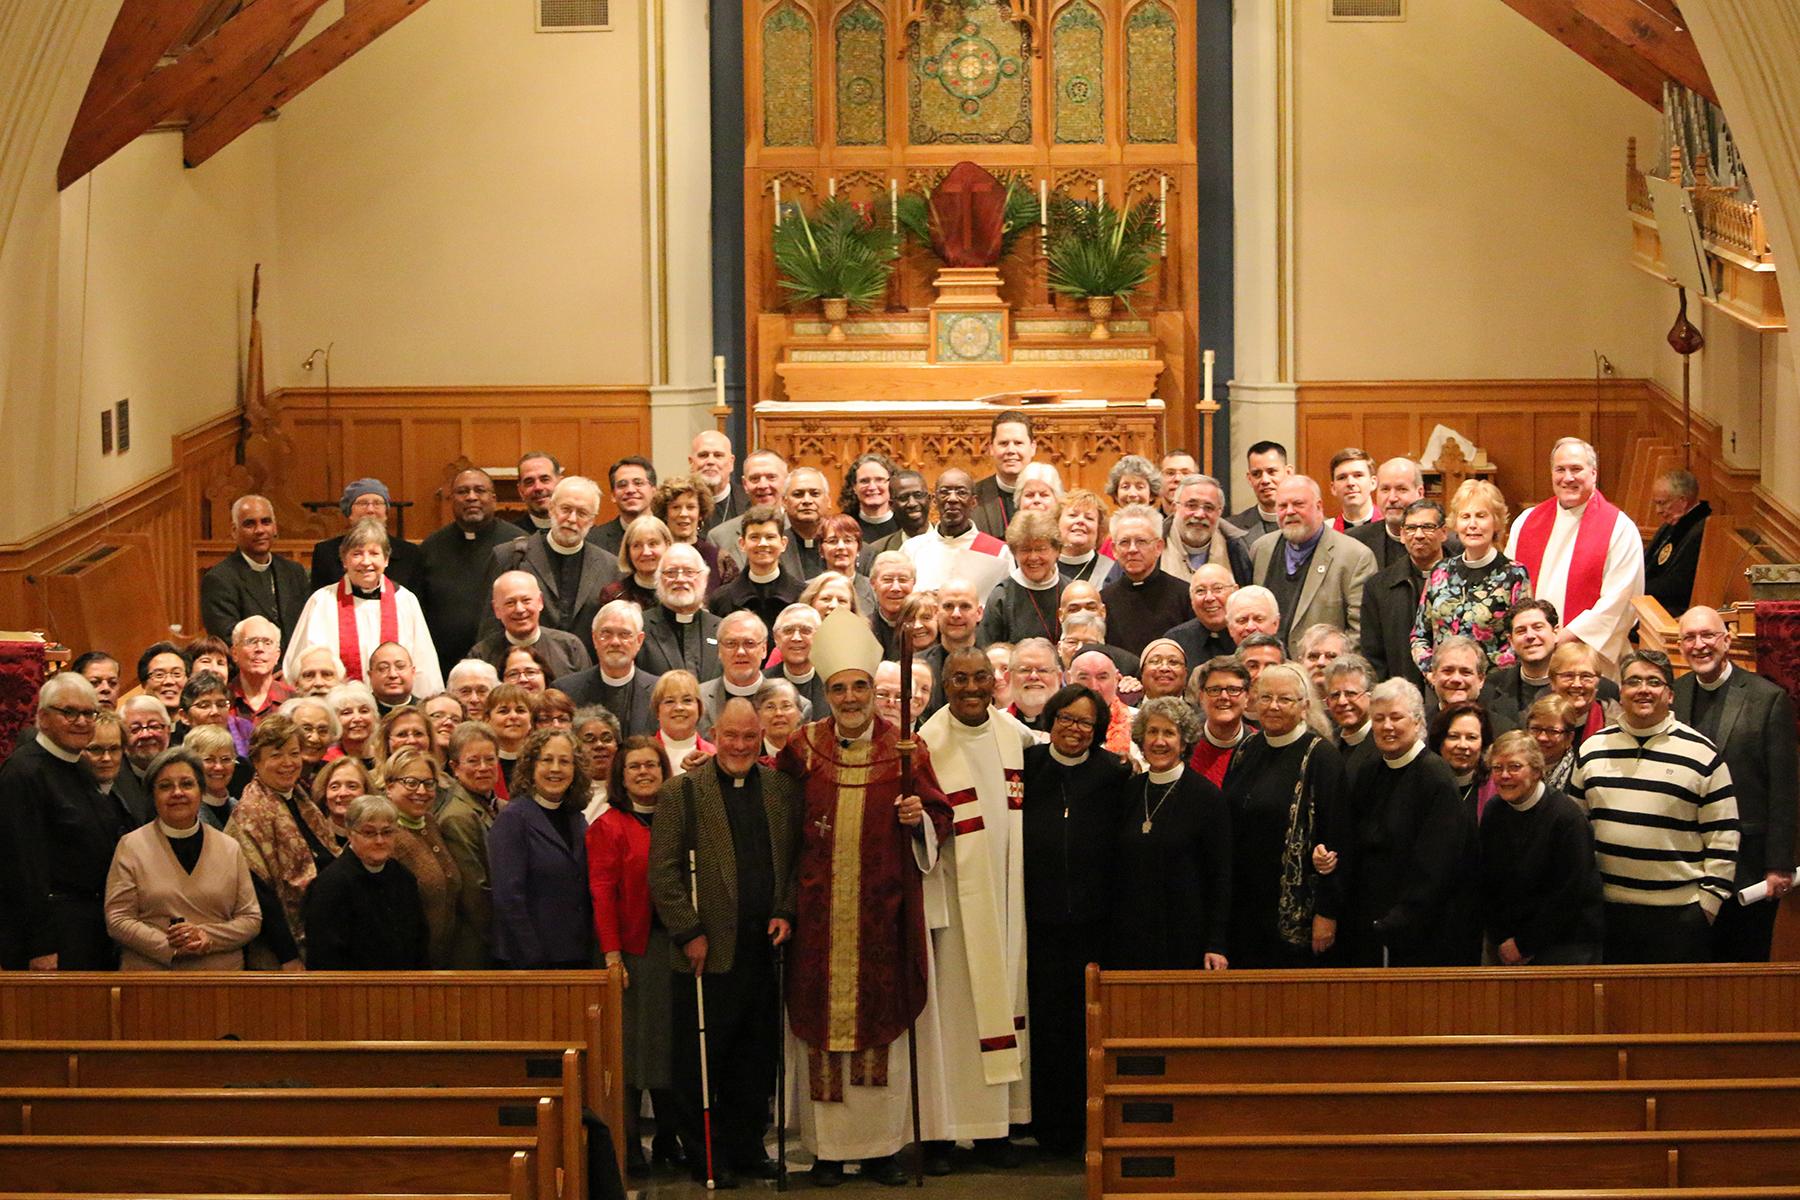 Clergy Group Portrait, March 2015